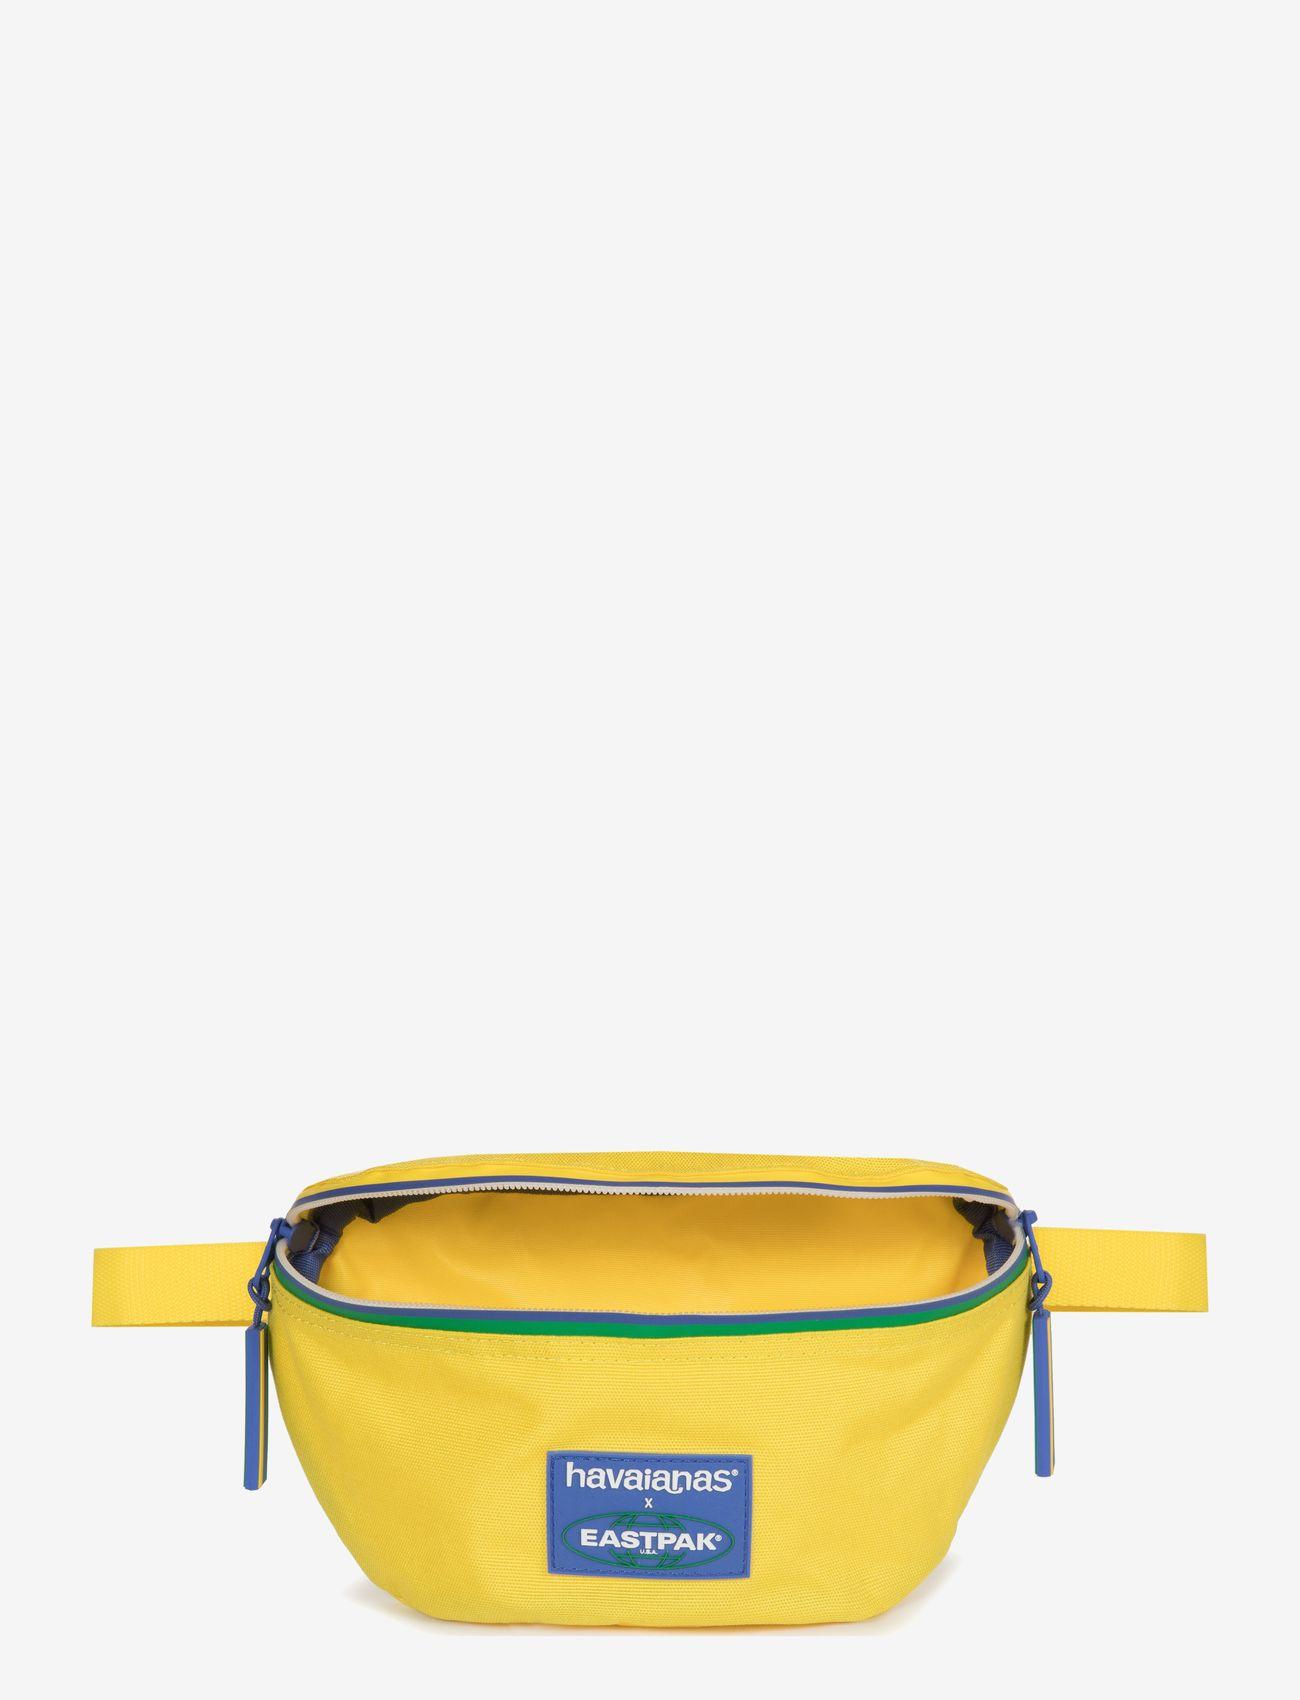 Eastpak - SPRINGER - heuptassen - havaianas yellow - 1